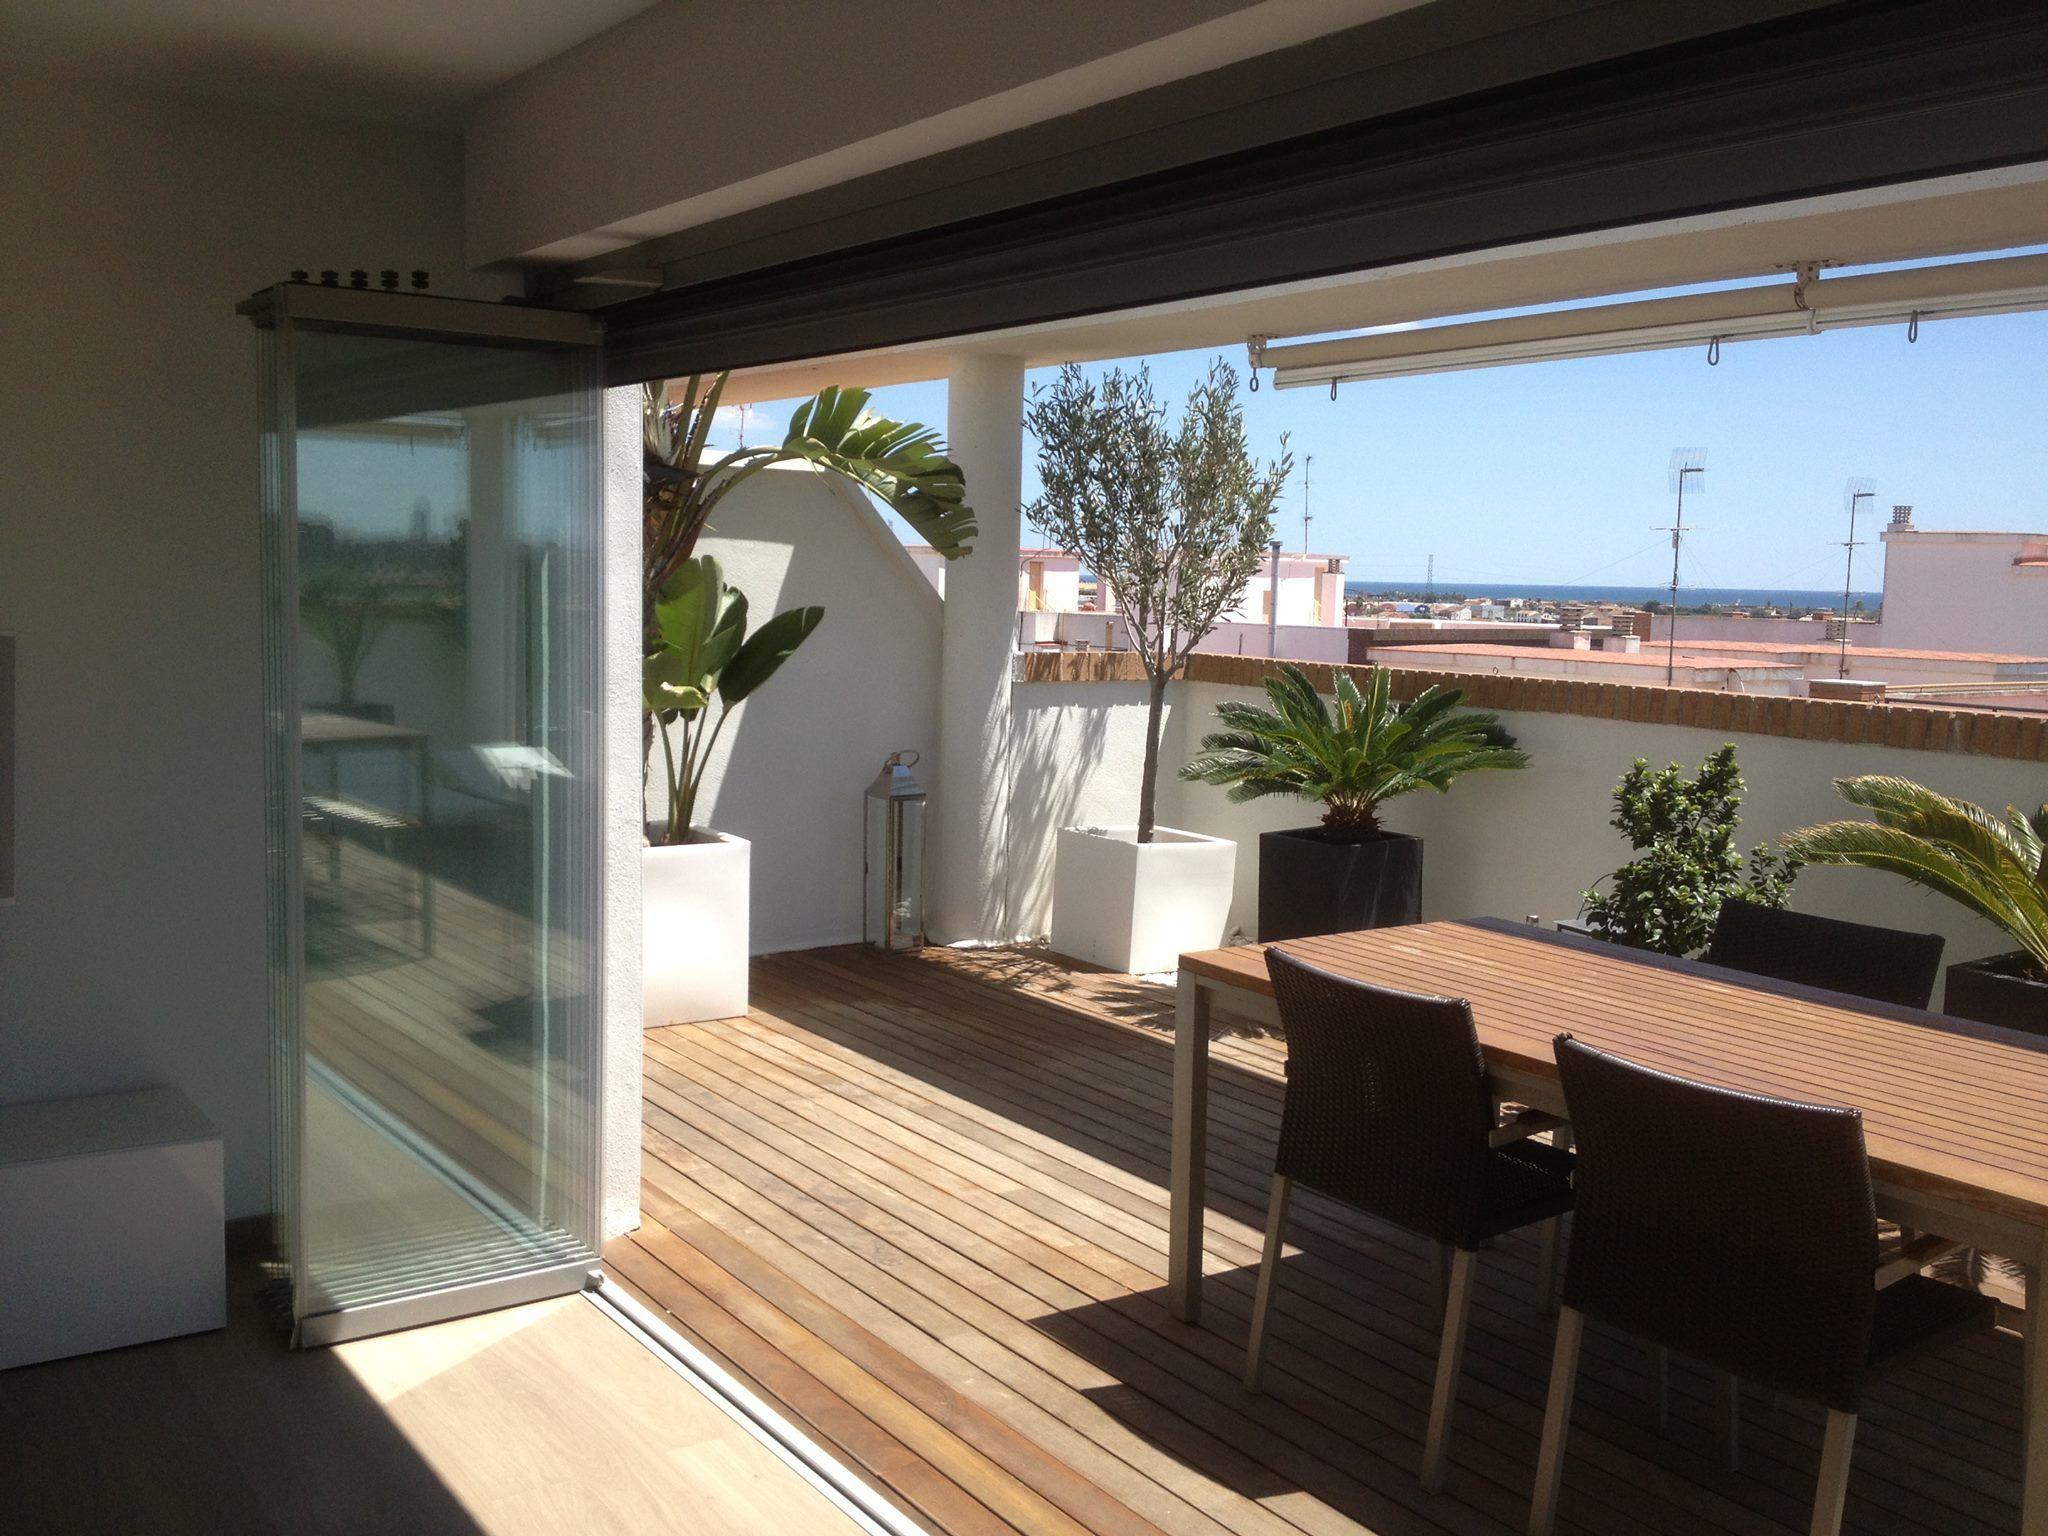 Cerramiento de terraza plegable cortina de cristal old for Cortina cristal terraza